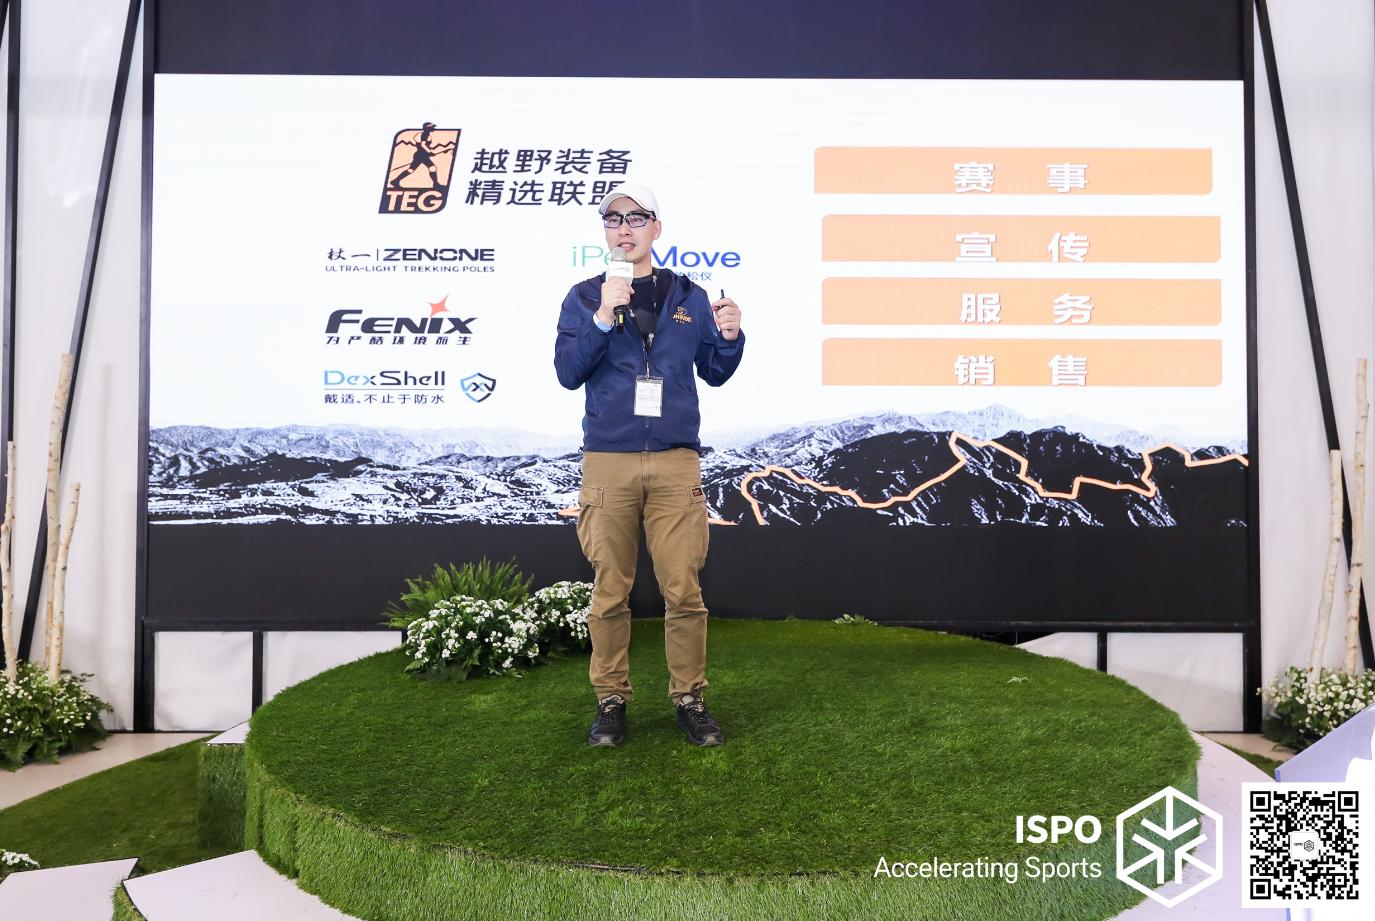 TEG携新成员戴适亮相上海ISPO趋势发布会 联盟优势更加明显